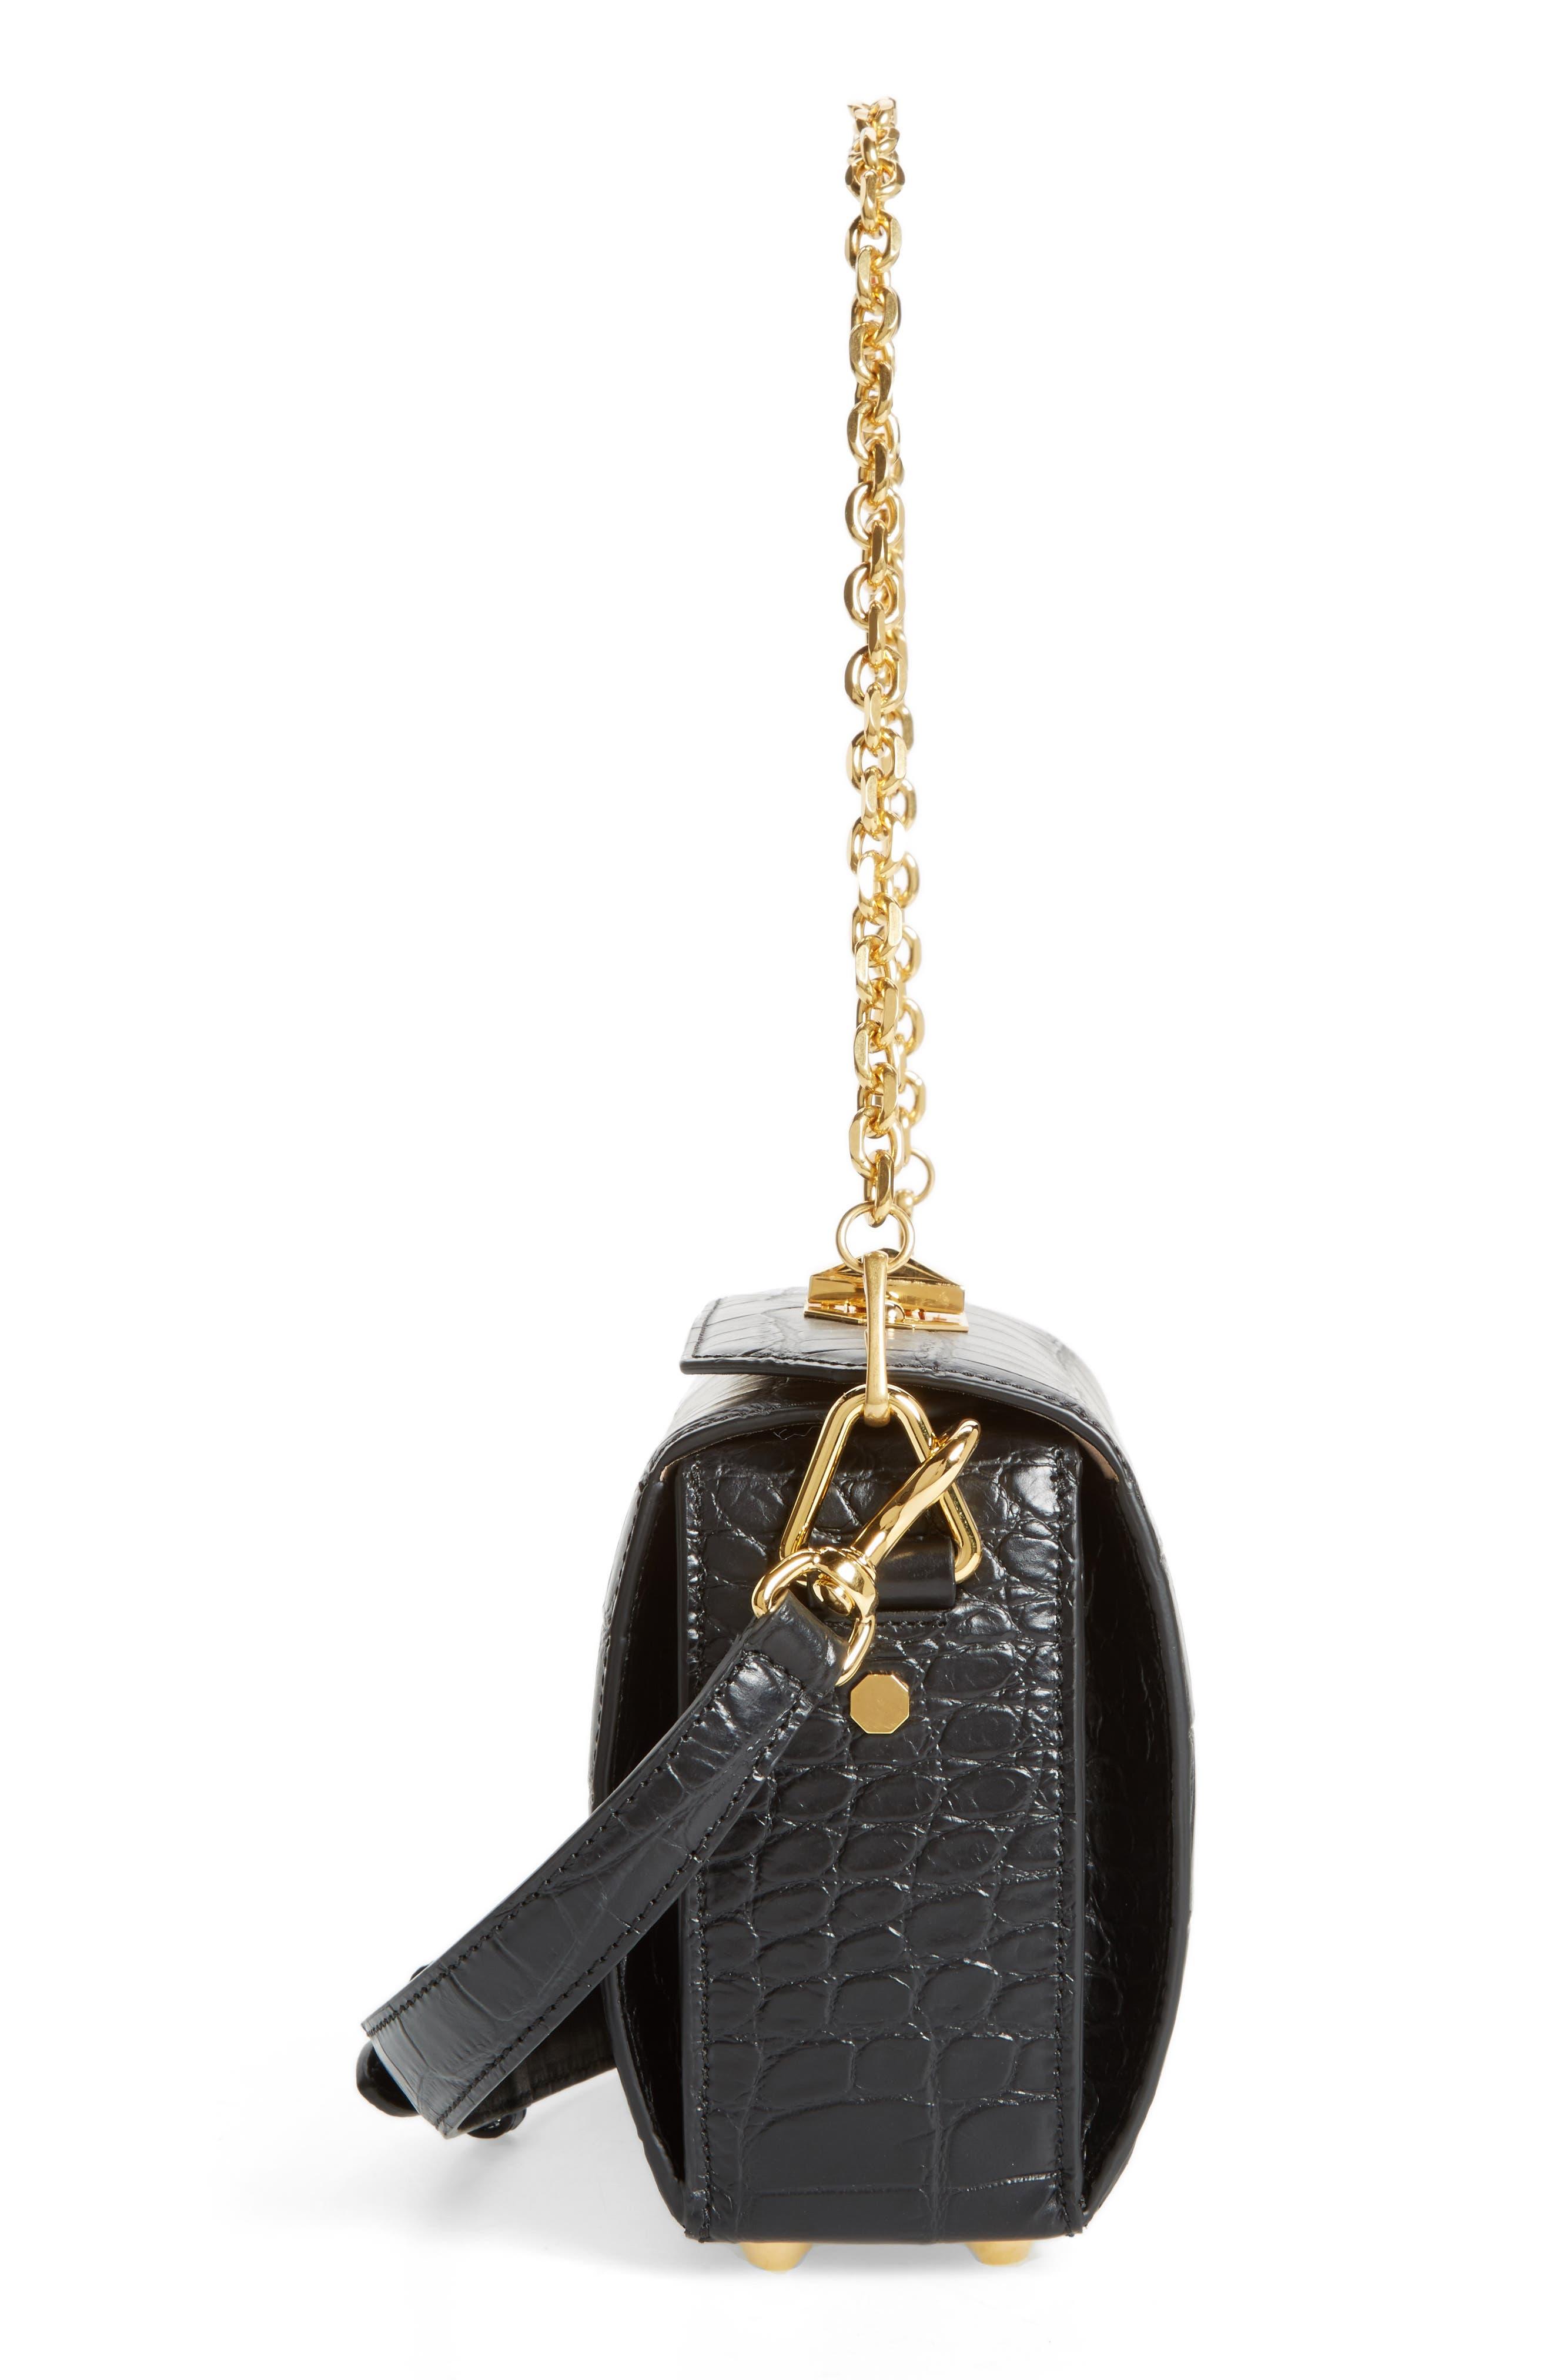 Box Bag 19 Croc Embossed Leather Bag,                             Alternate thumbnail 5, color,                             Black